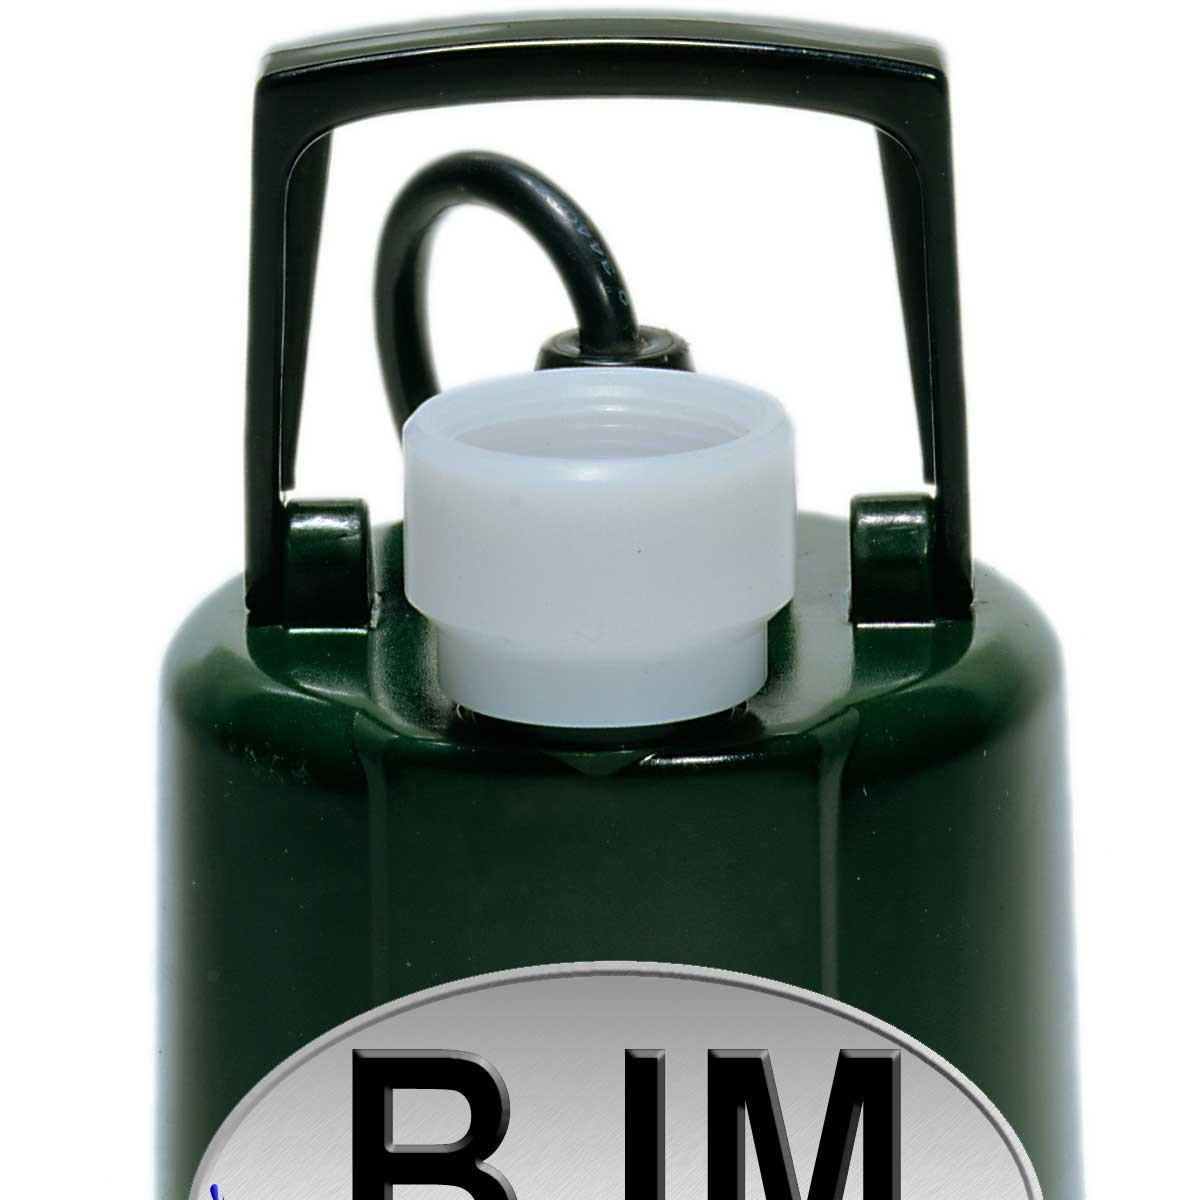 201358 BJM Submersible Pump 110V